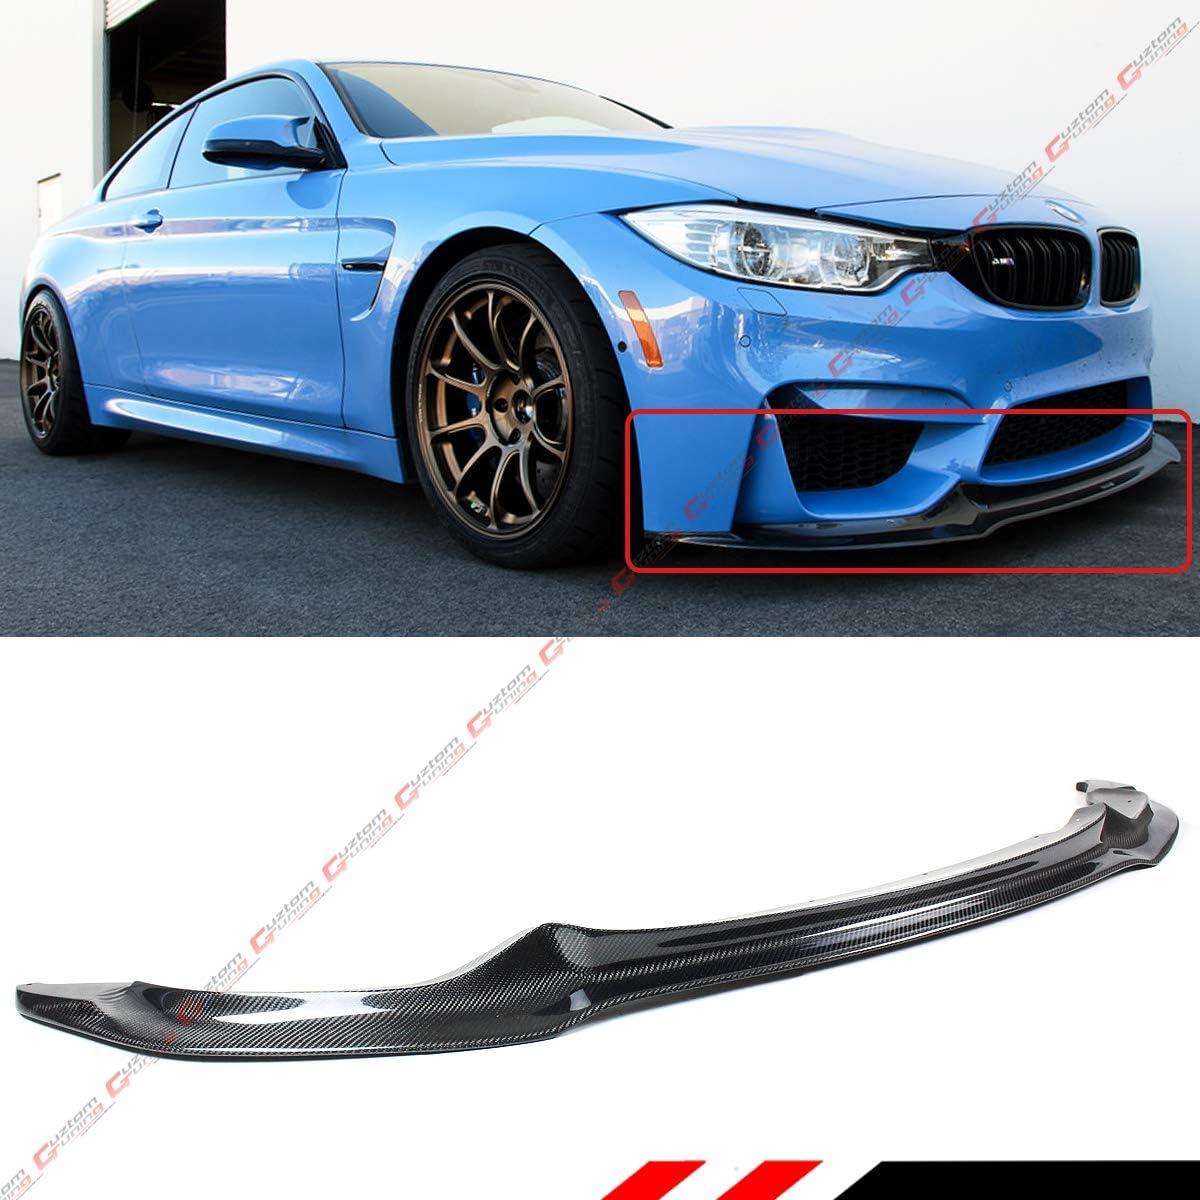 NINTE Front Lip for 2014-2020 BMW F80 M3 F82//F83 M4 CS Style Carbon Fiber Front Bumper Lip Splitter